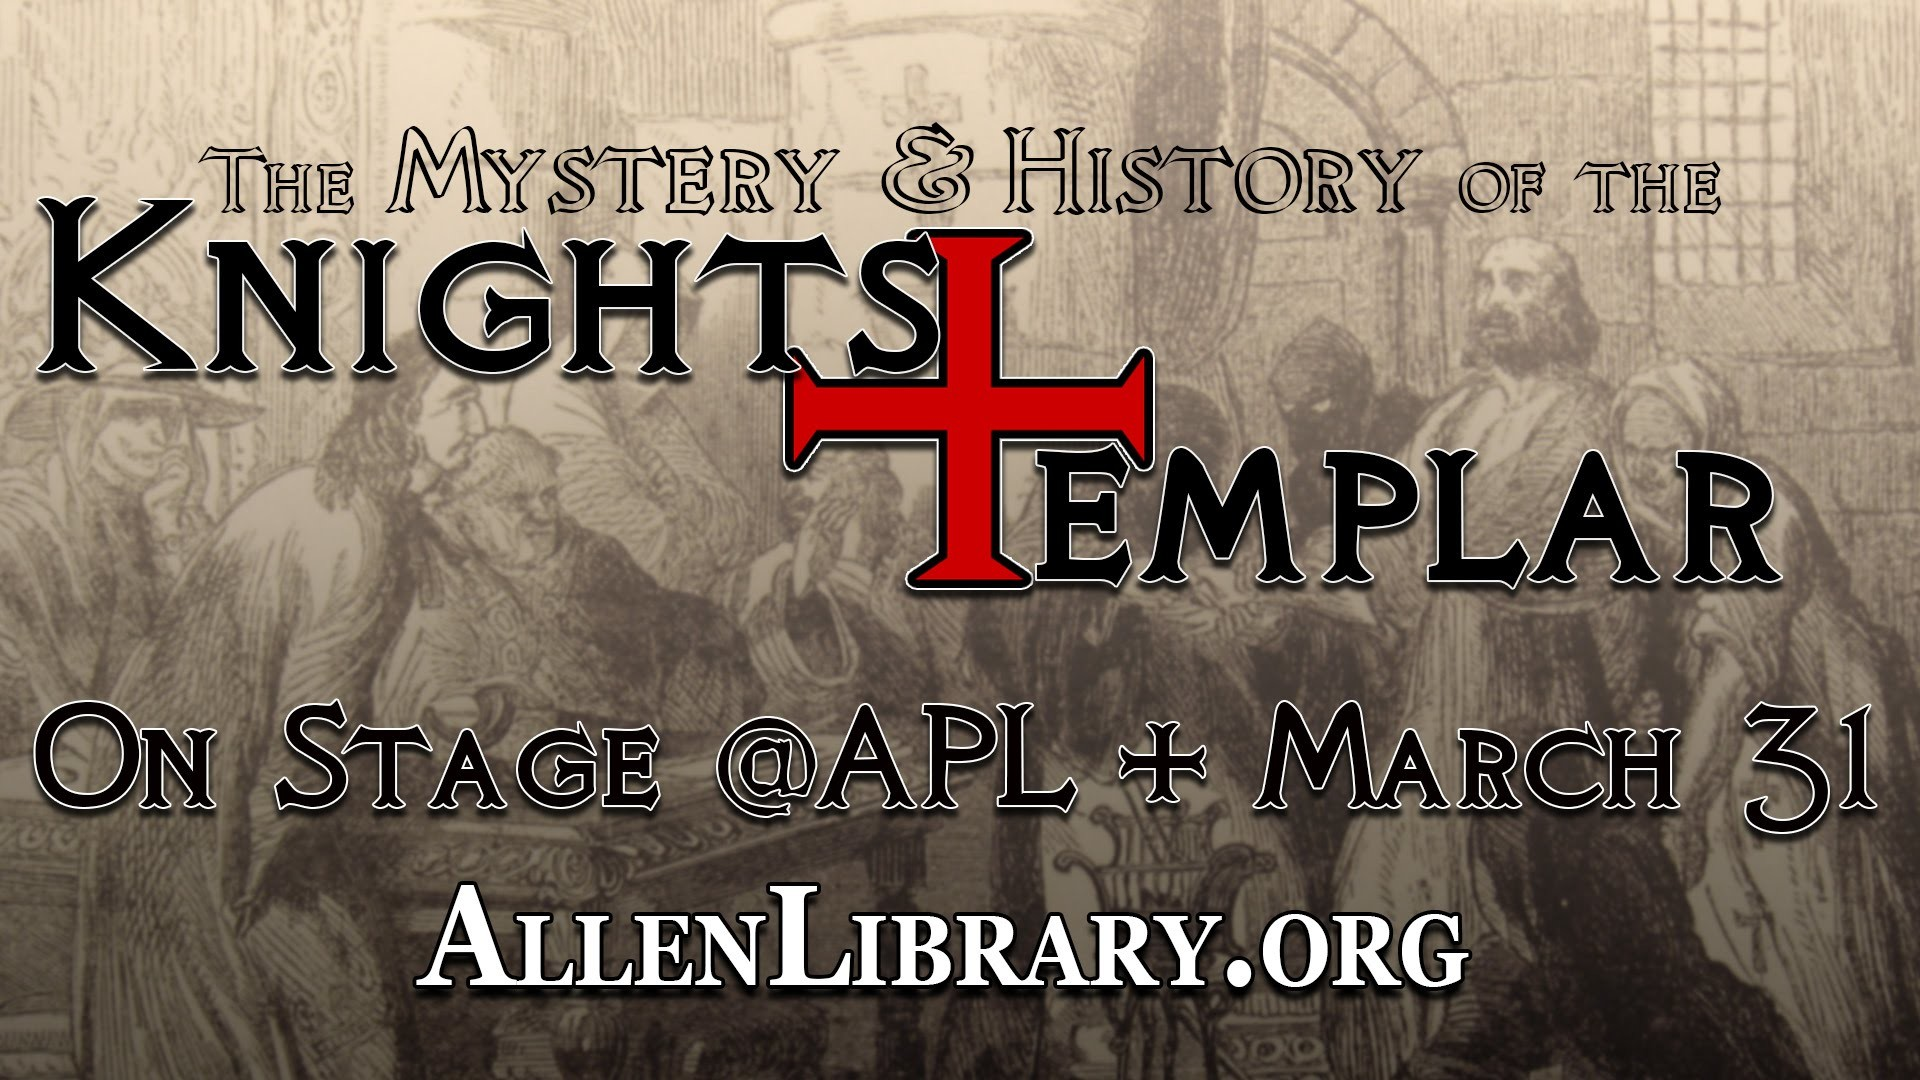 Mystery & History : Knights Templar